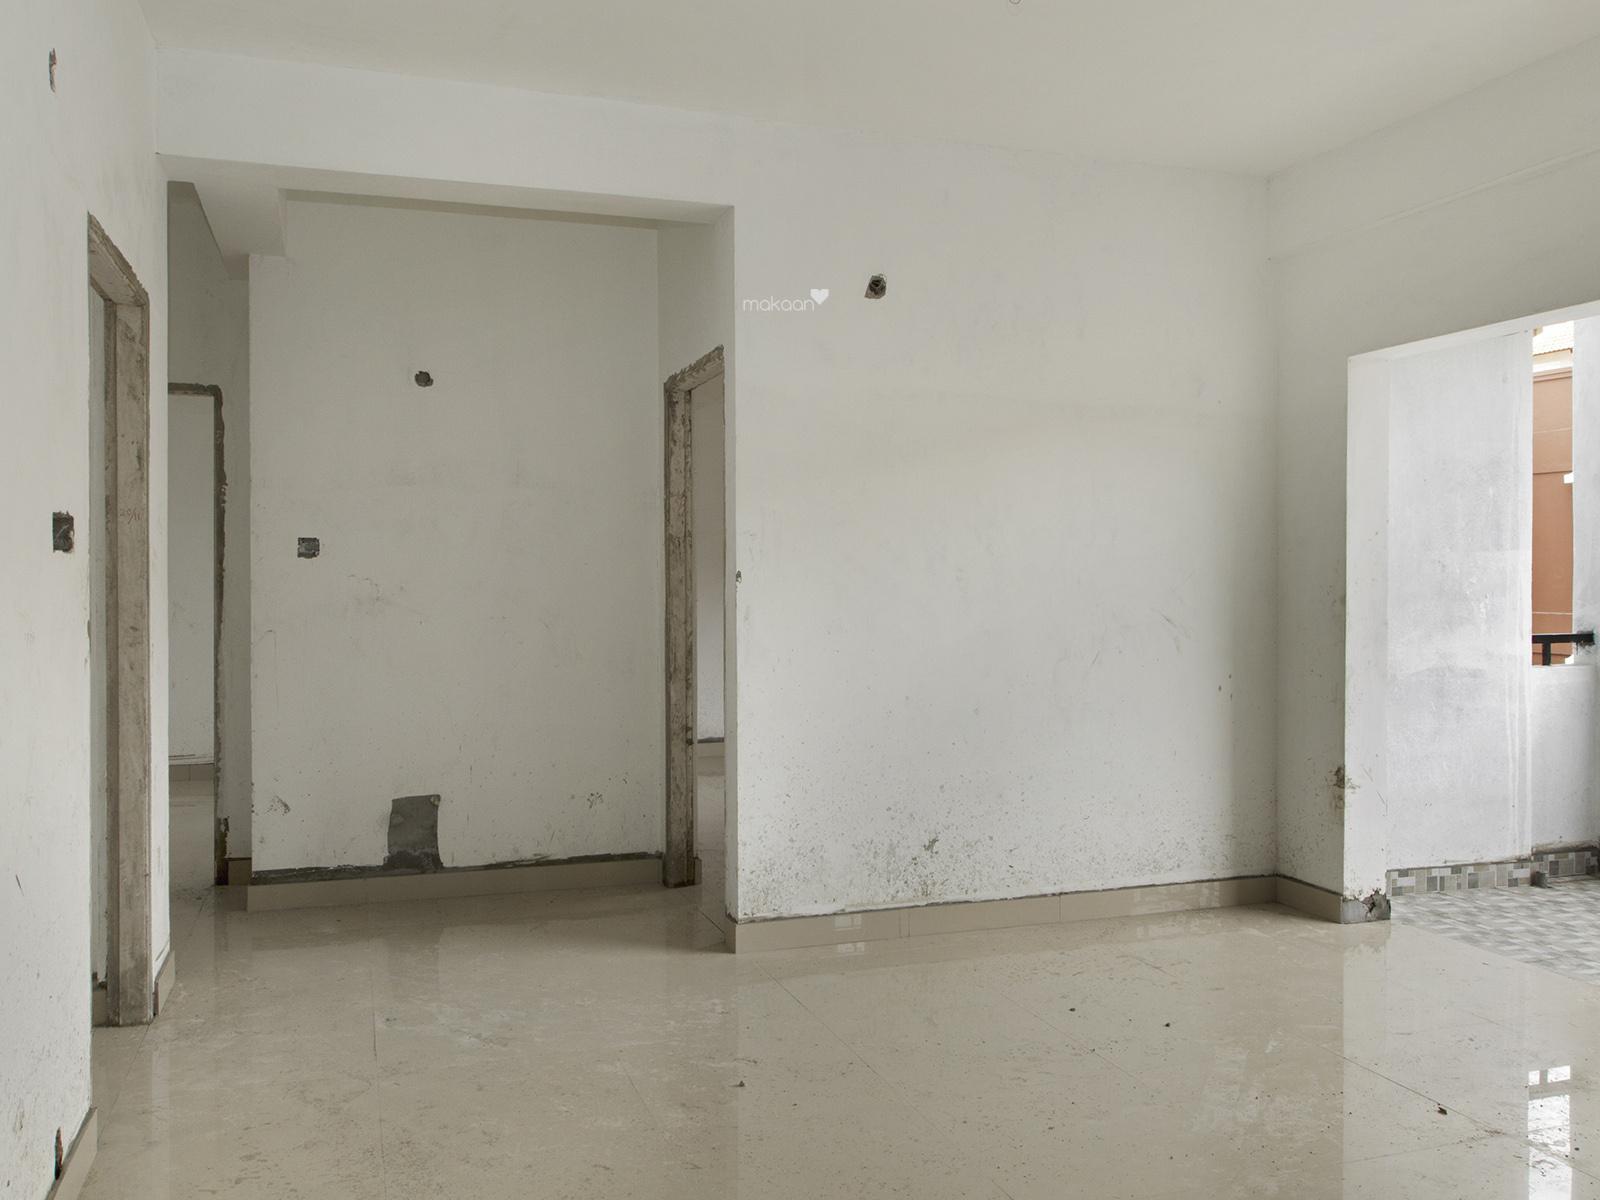 1650 sq ft 3BHK 3BHK+3T (1,650 sq ft) Property By Proptiger In Bhavya Serene, Kasavanahalli Off Sarjapur Road